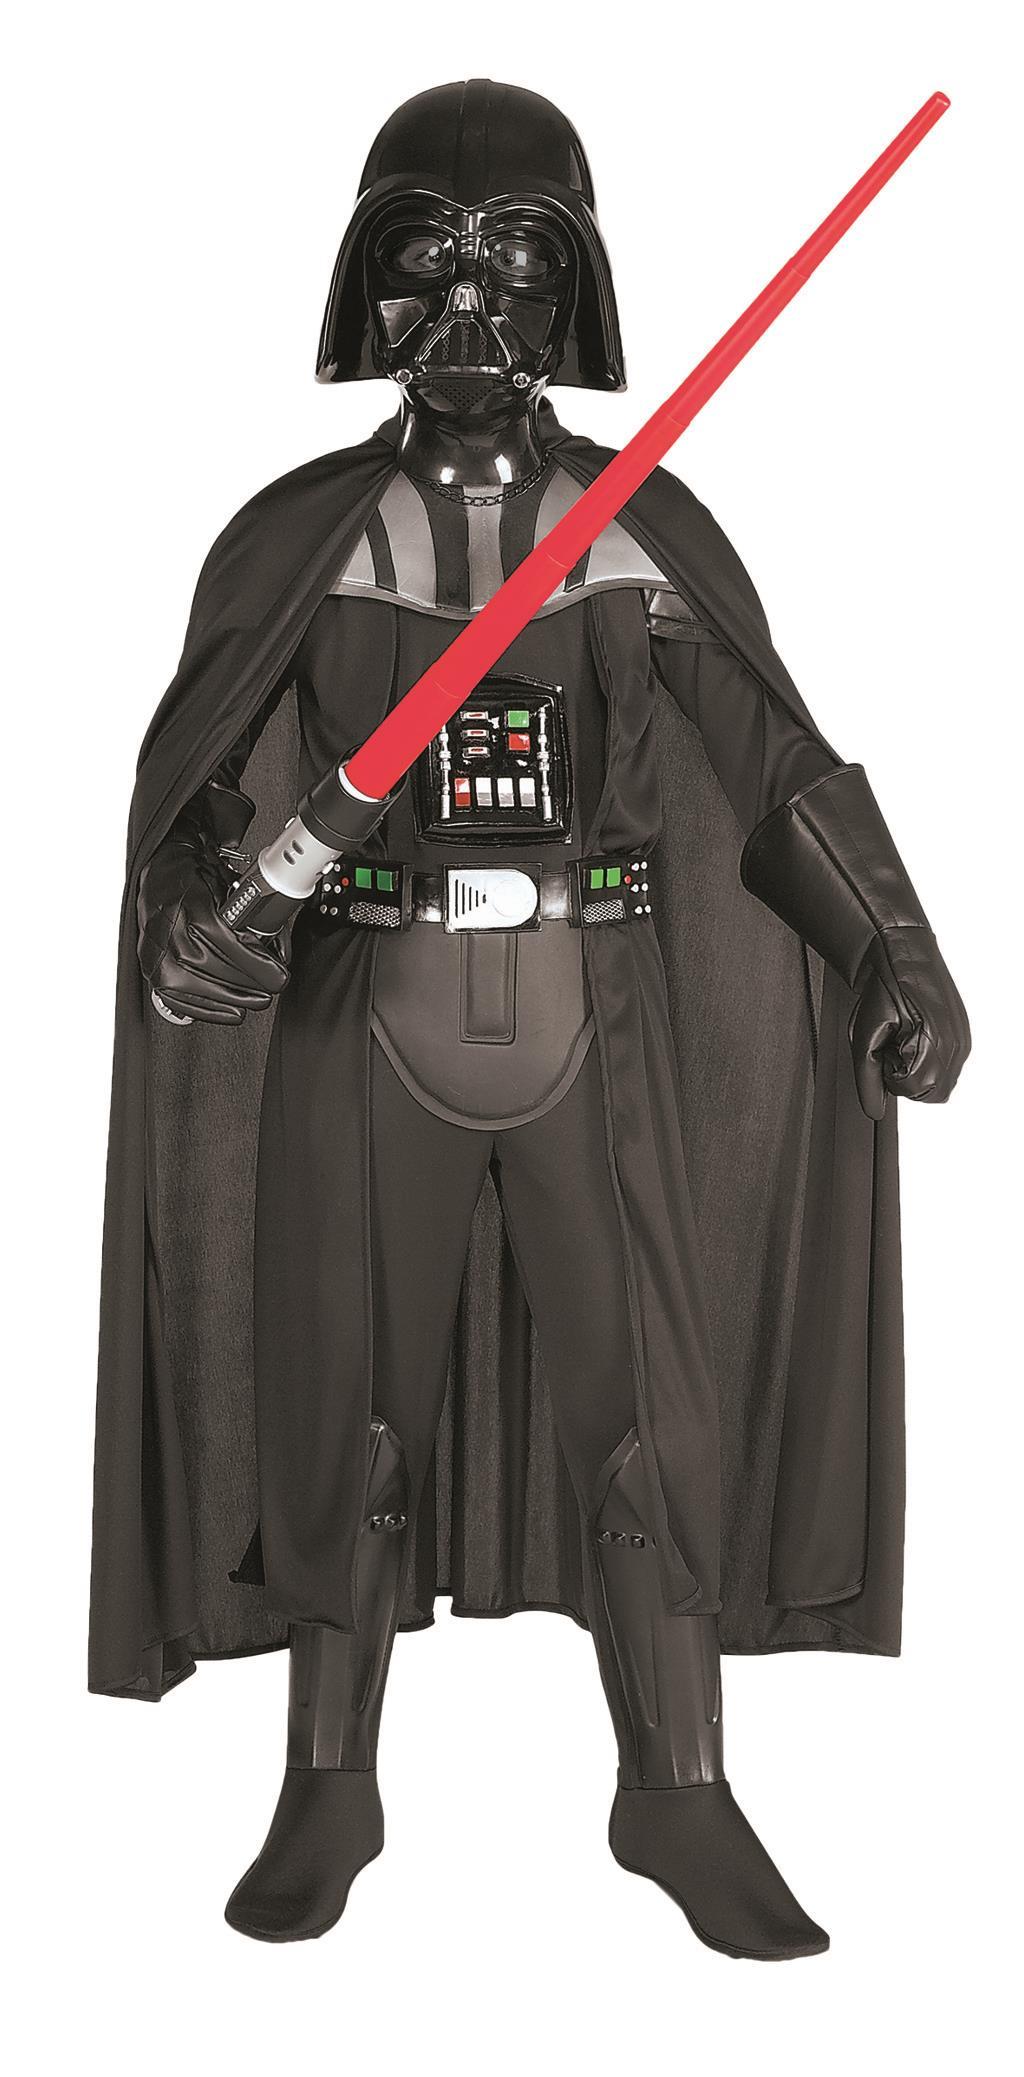 Dětský kostým Darth Vader Deluxe Star Wars - DOPRAVA OD 49,- Kč (ZÁSILKOVNA.CZ)